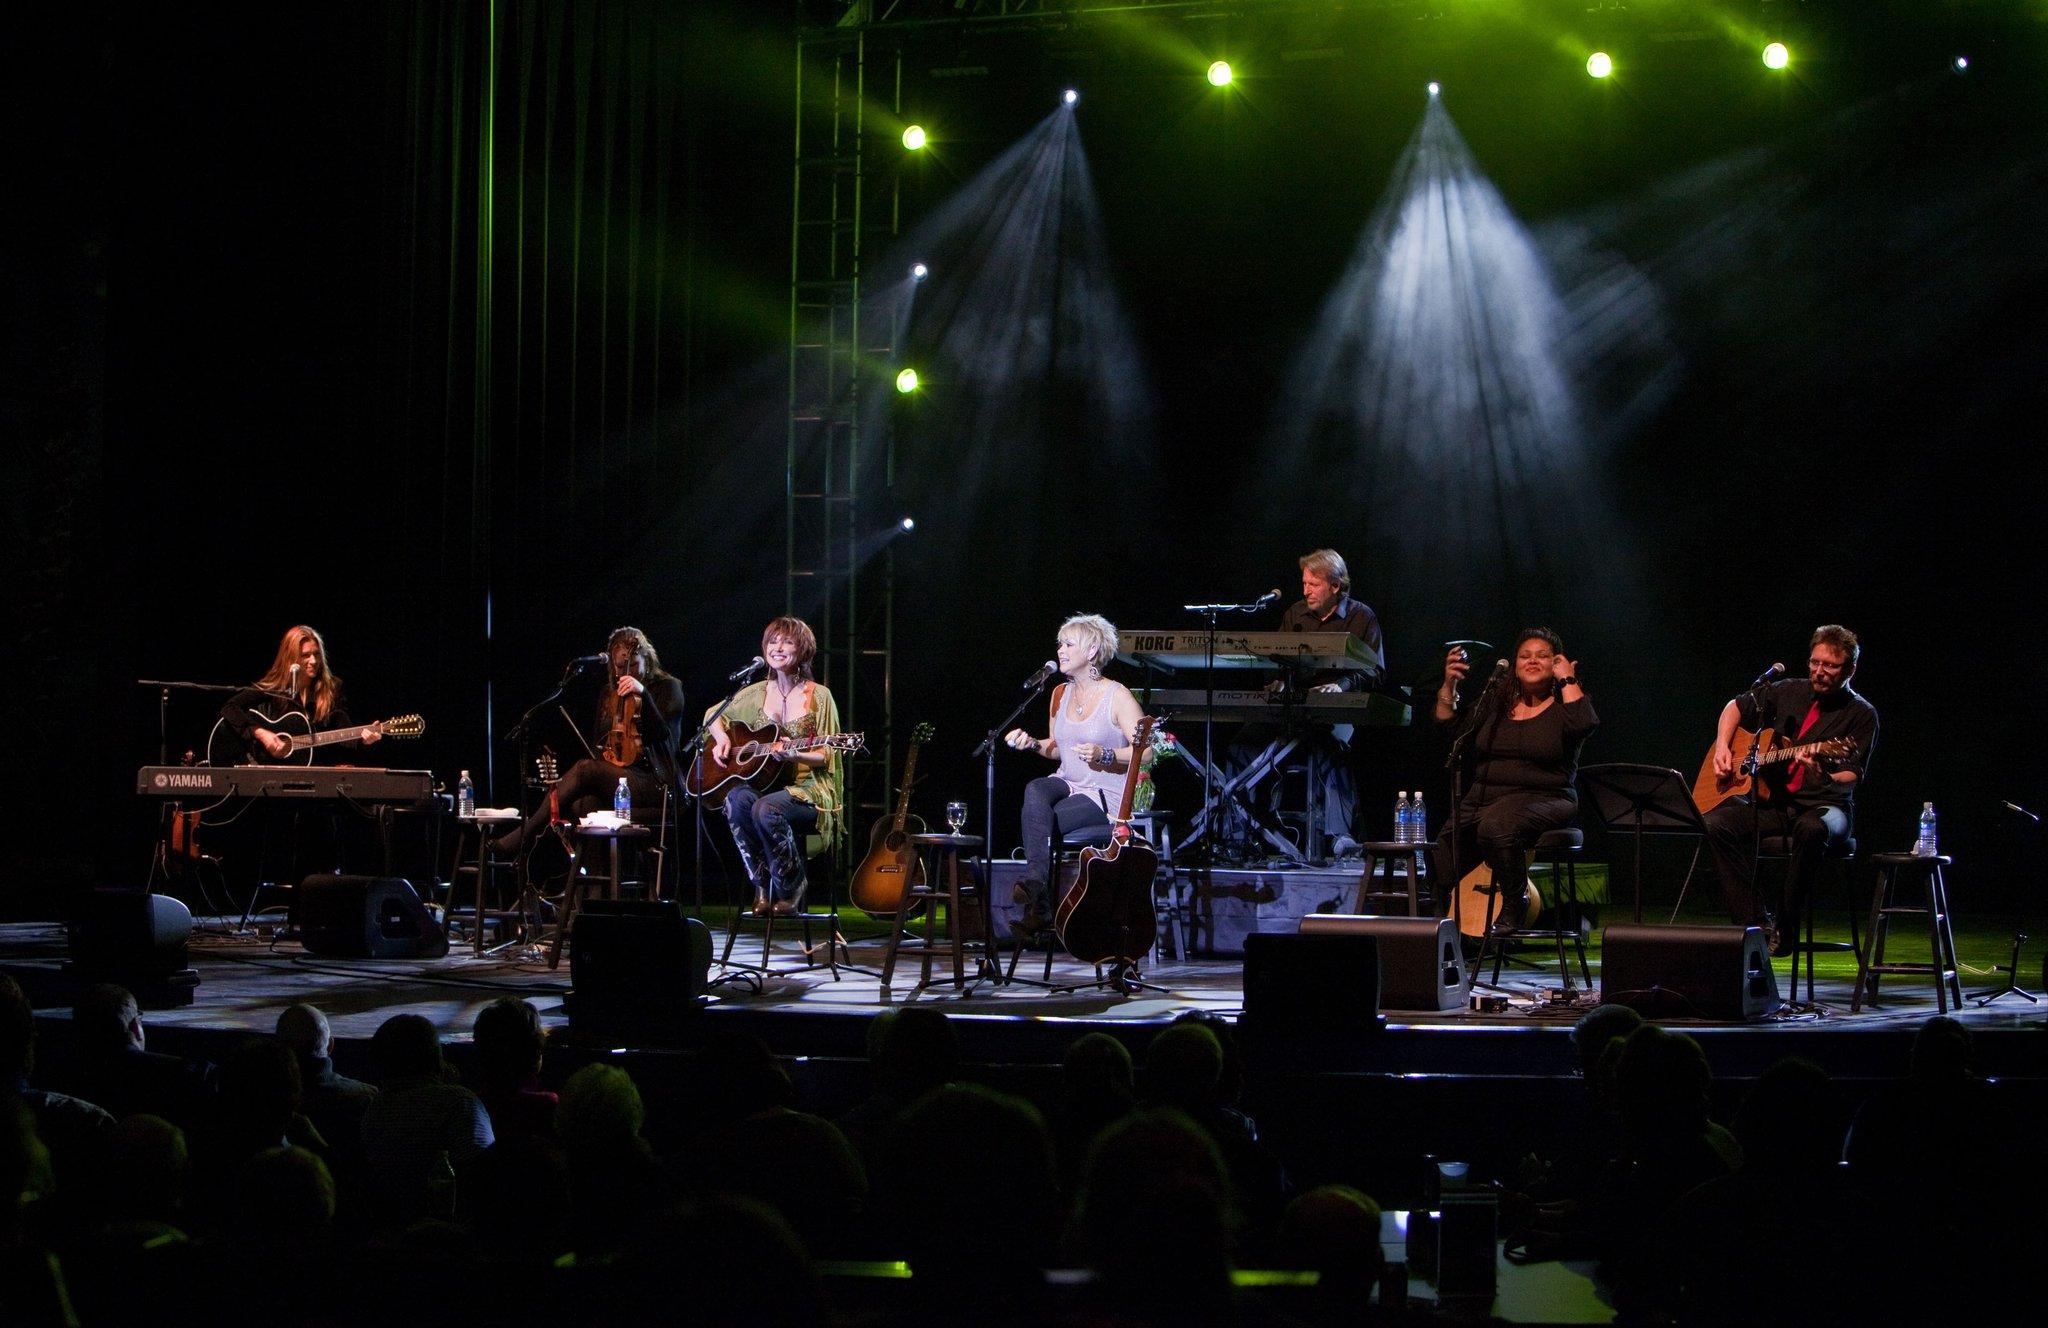 Pam Tillis, Lorrie Morgan, Mark & Band